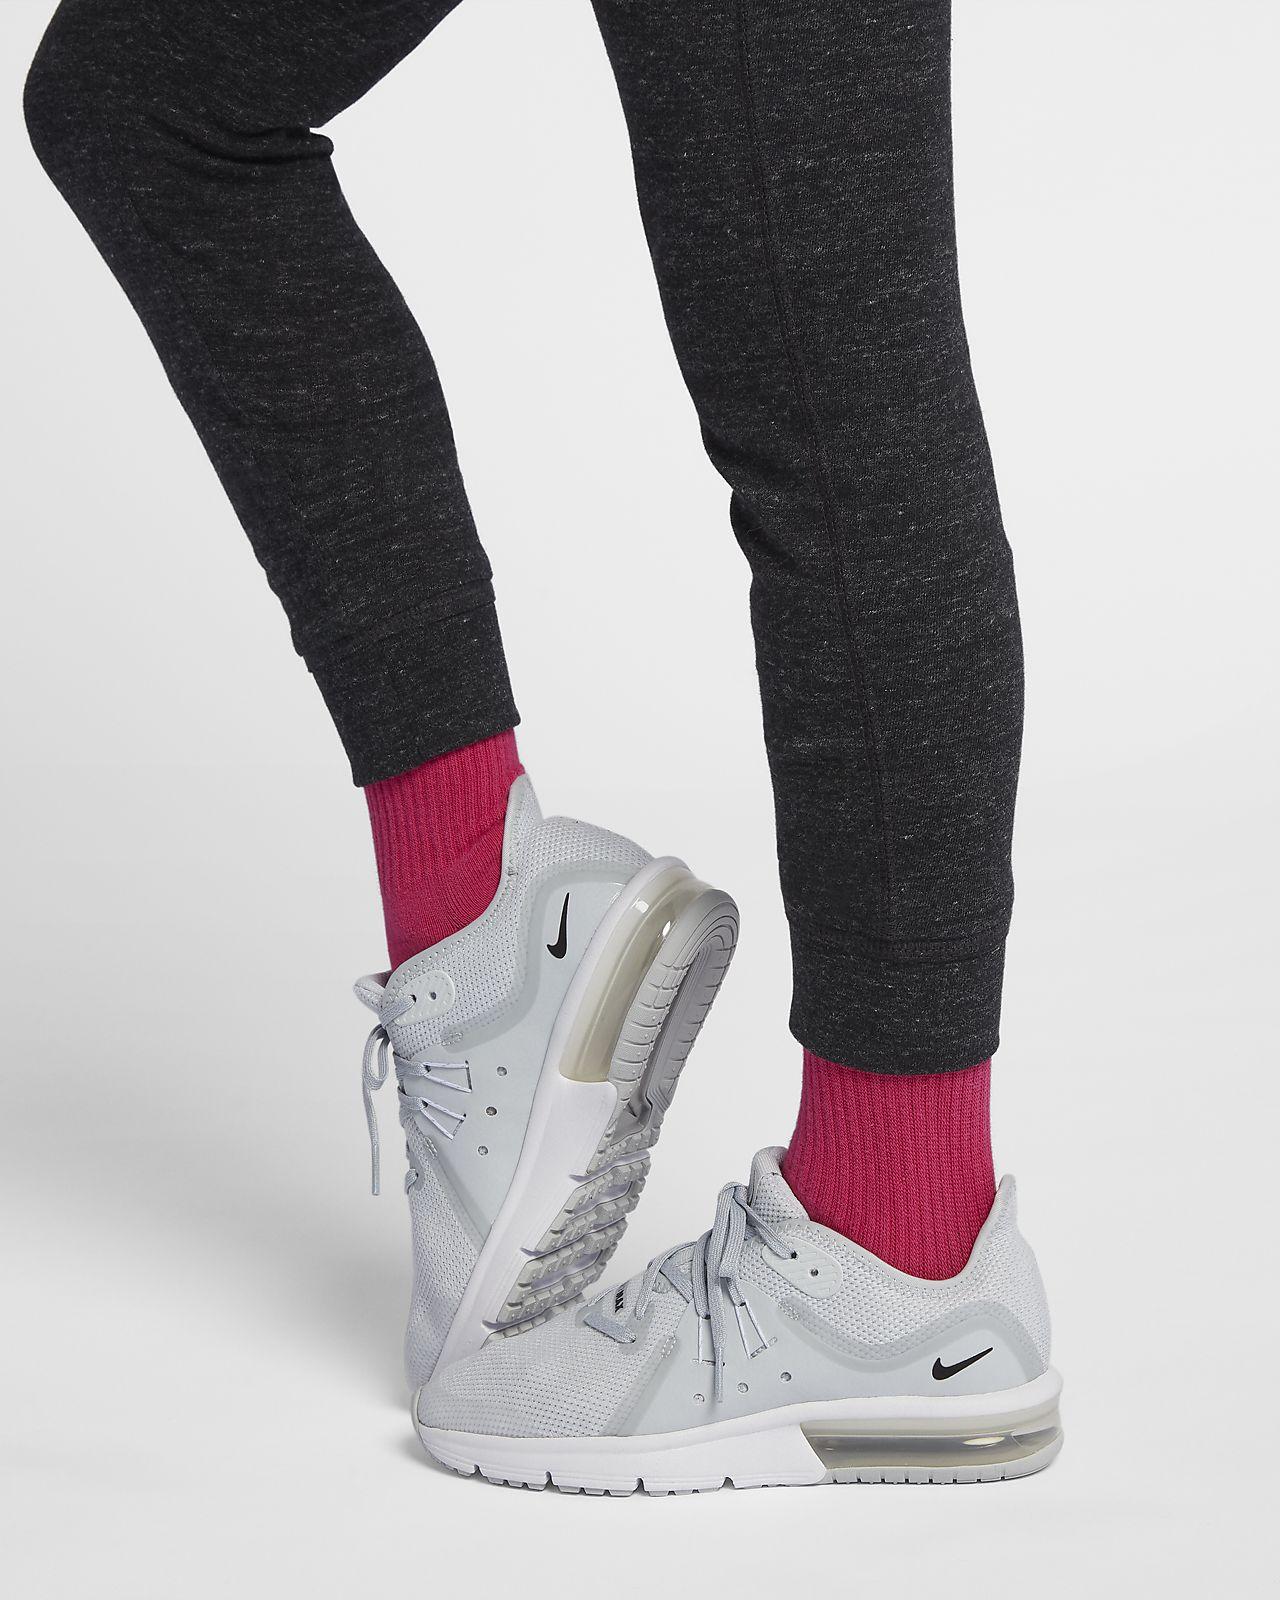 Calzado para niños talla grande Nike Air Max Sequent 3